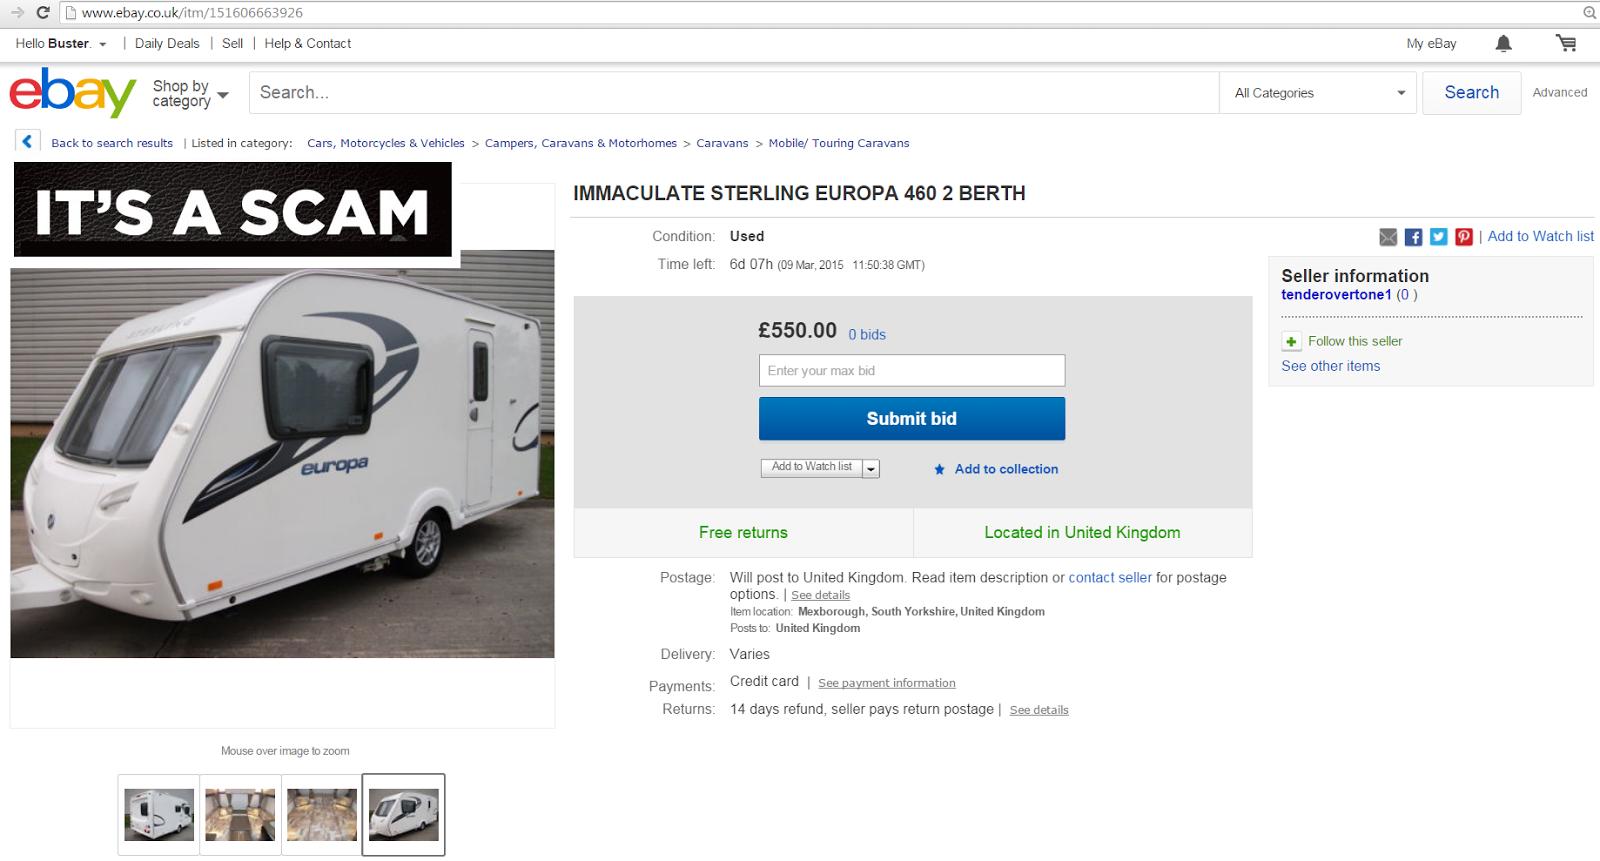 Ebay scam : Sterling europa 460 caravan - fraud on ebay - 03-mar-15 ...